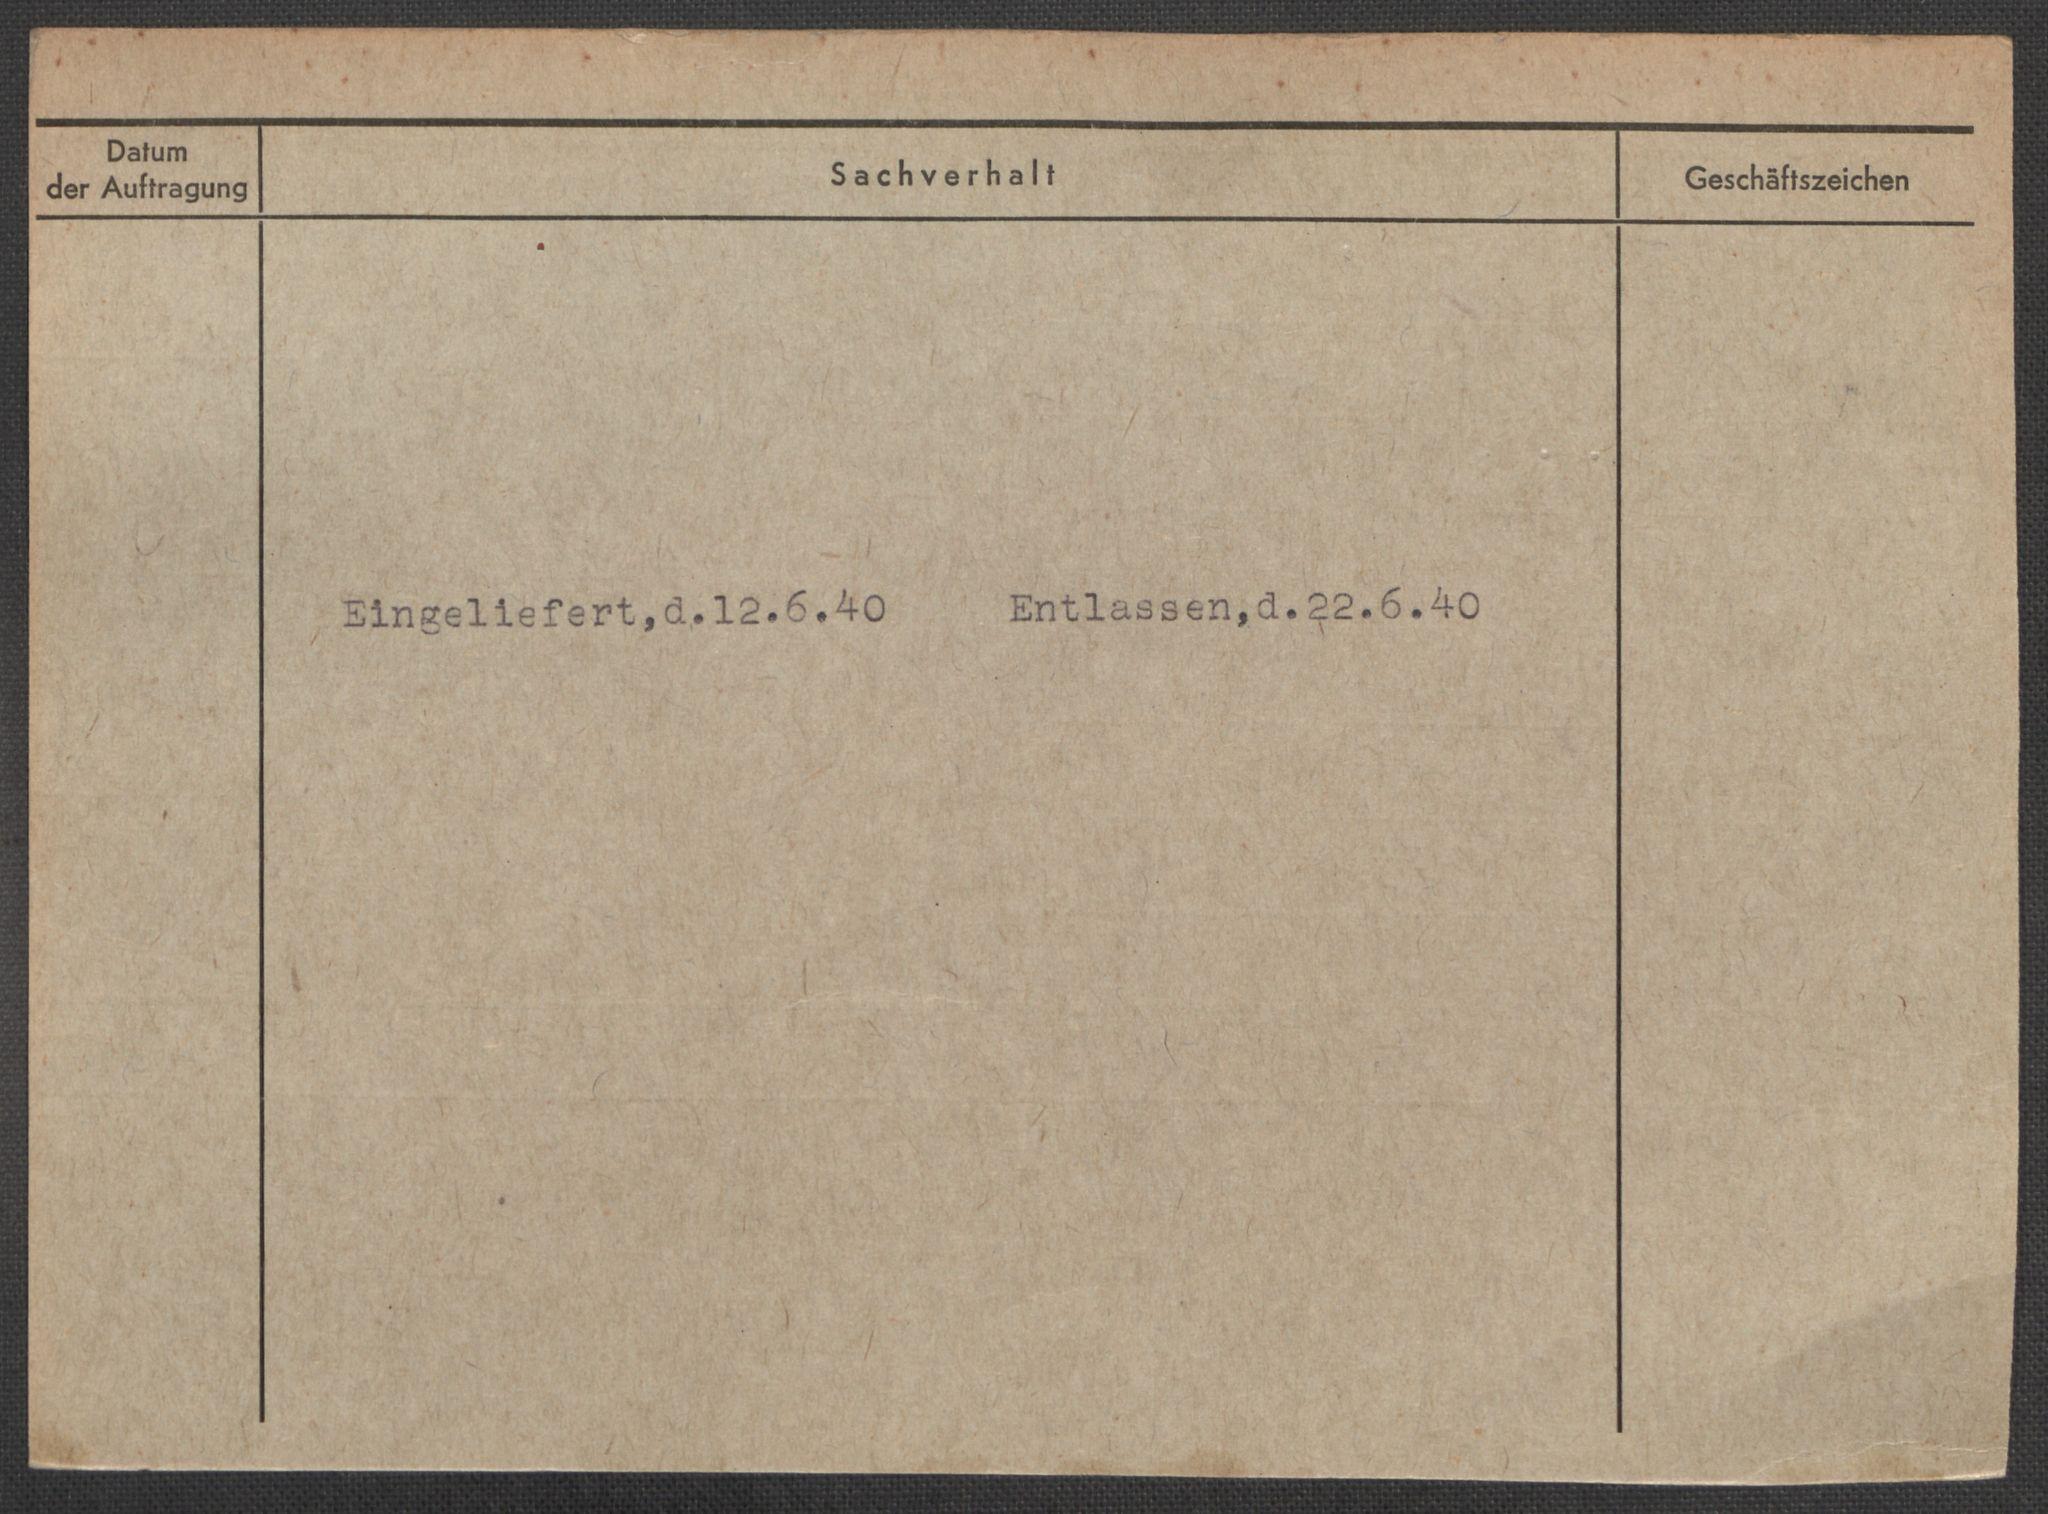 RA, Befehlshaber der Sicherheitspolizei und des SD, E/Ea/Eaa/L0007: Register over norske fanger i Møllergata 19: Lundb-N, 1940-1945, p. 847